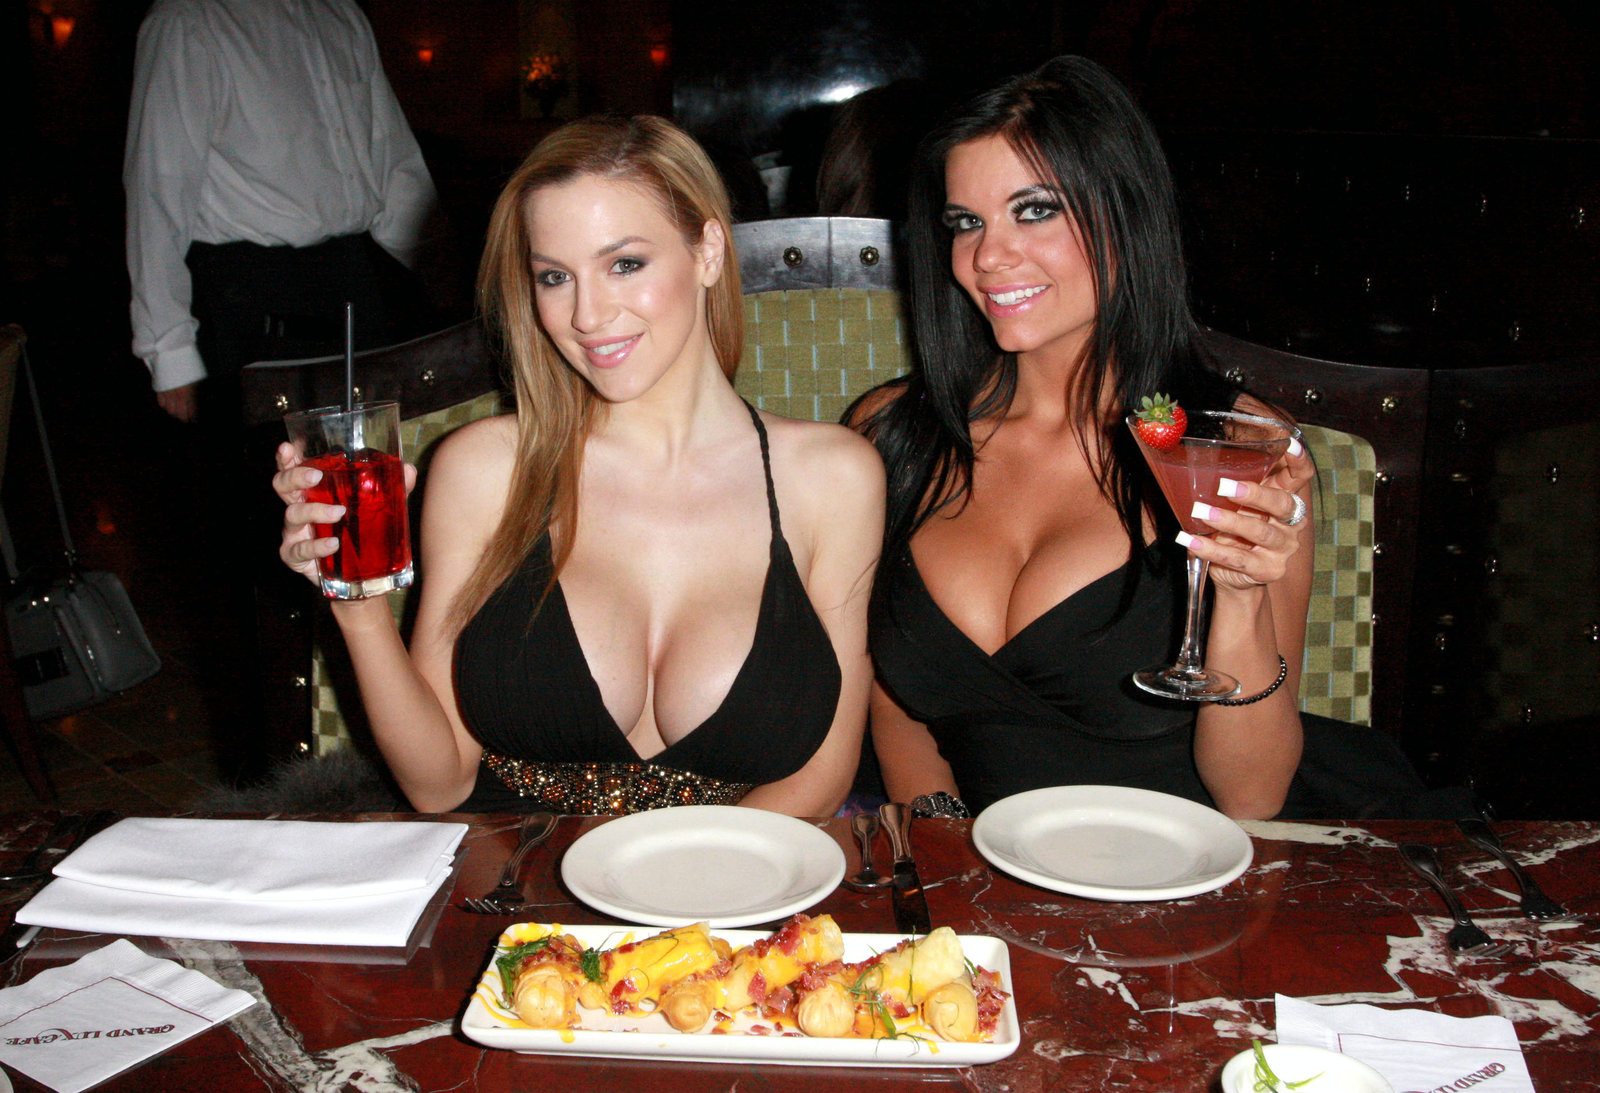 Jordan Carver Partying Hot Photos With Her Biggies